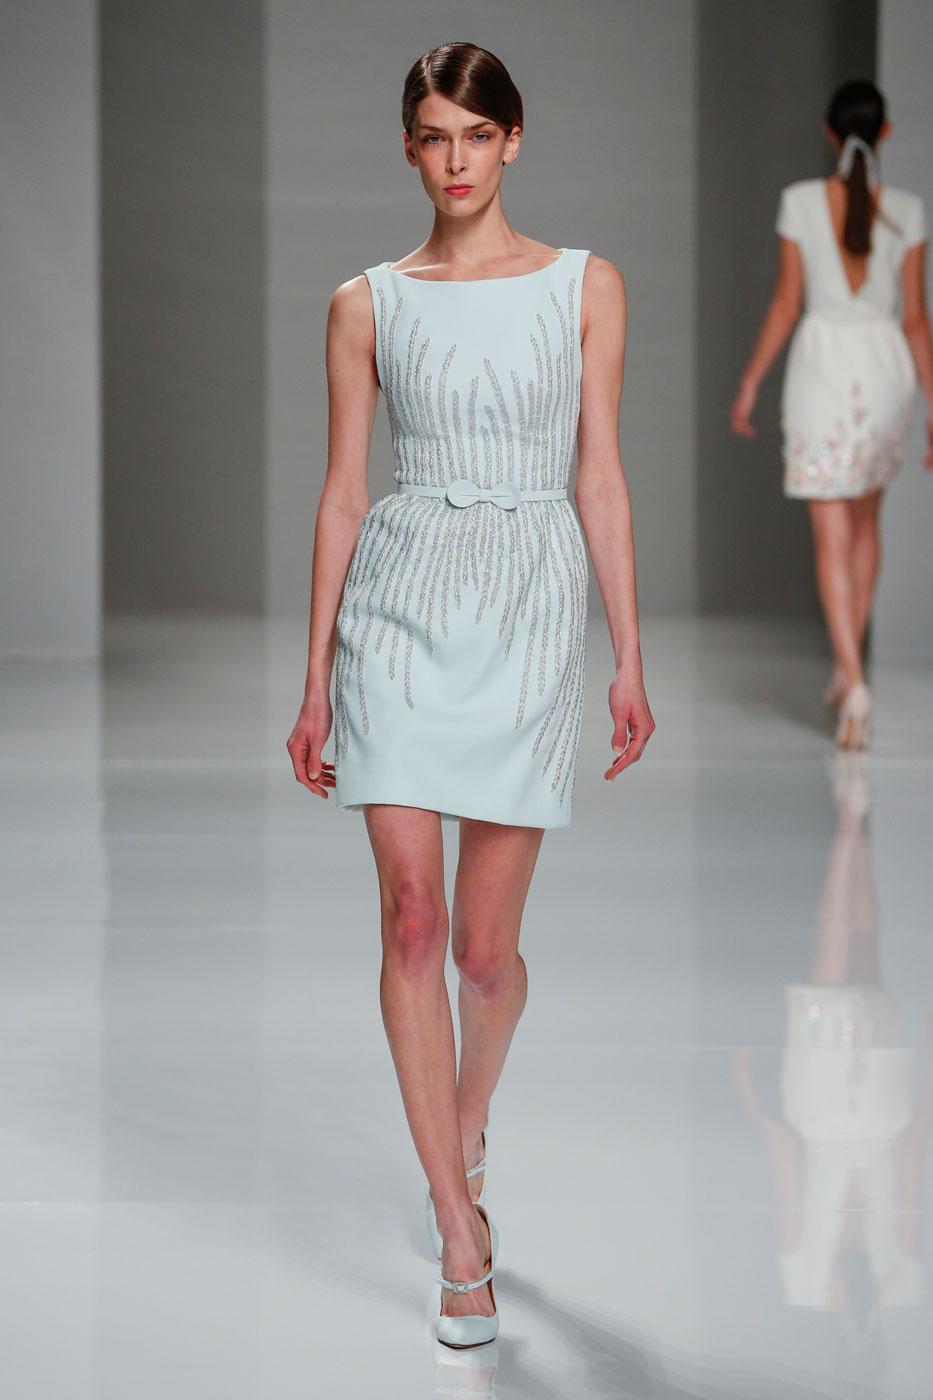 Georges-Hobeika-fashion-runway-show-haute-couture-paris-spring-2015-the-impression-07